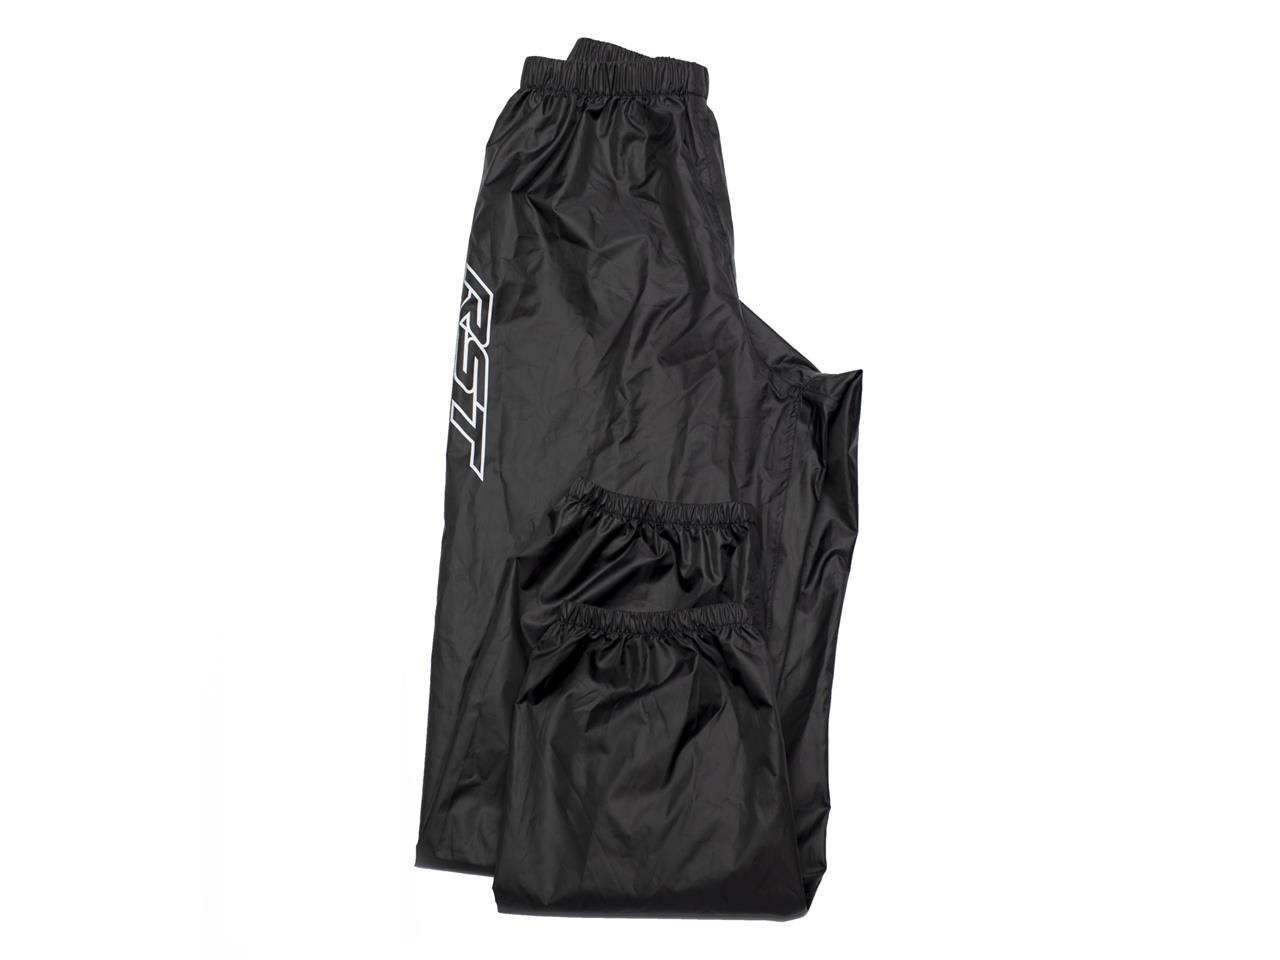 Pantalon pluie RST Lightweight noir taille 3XL